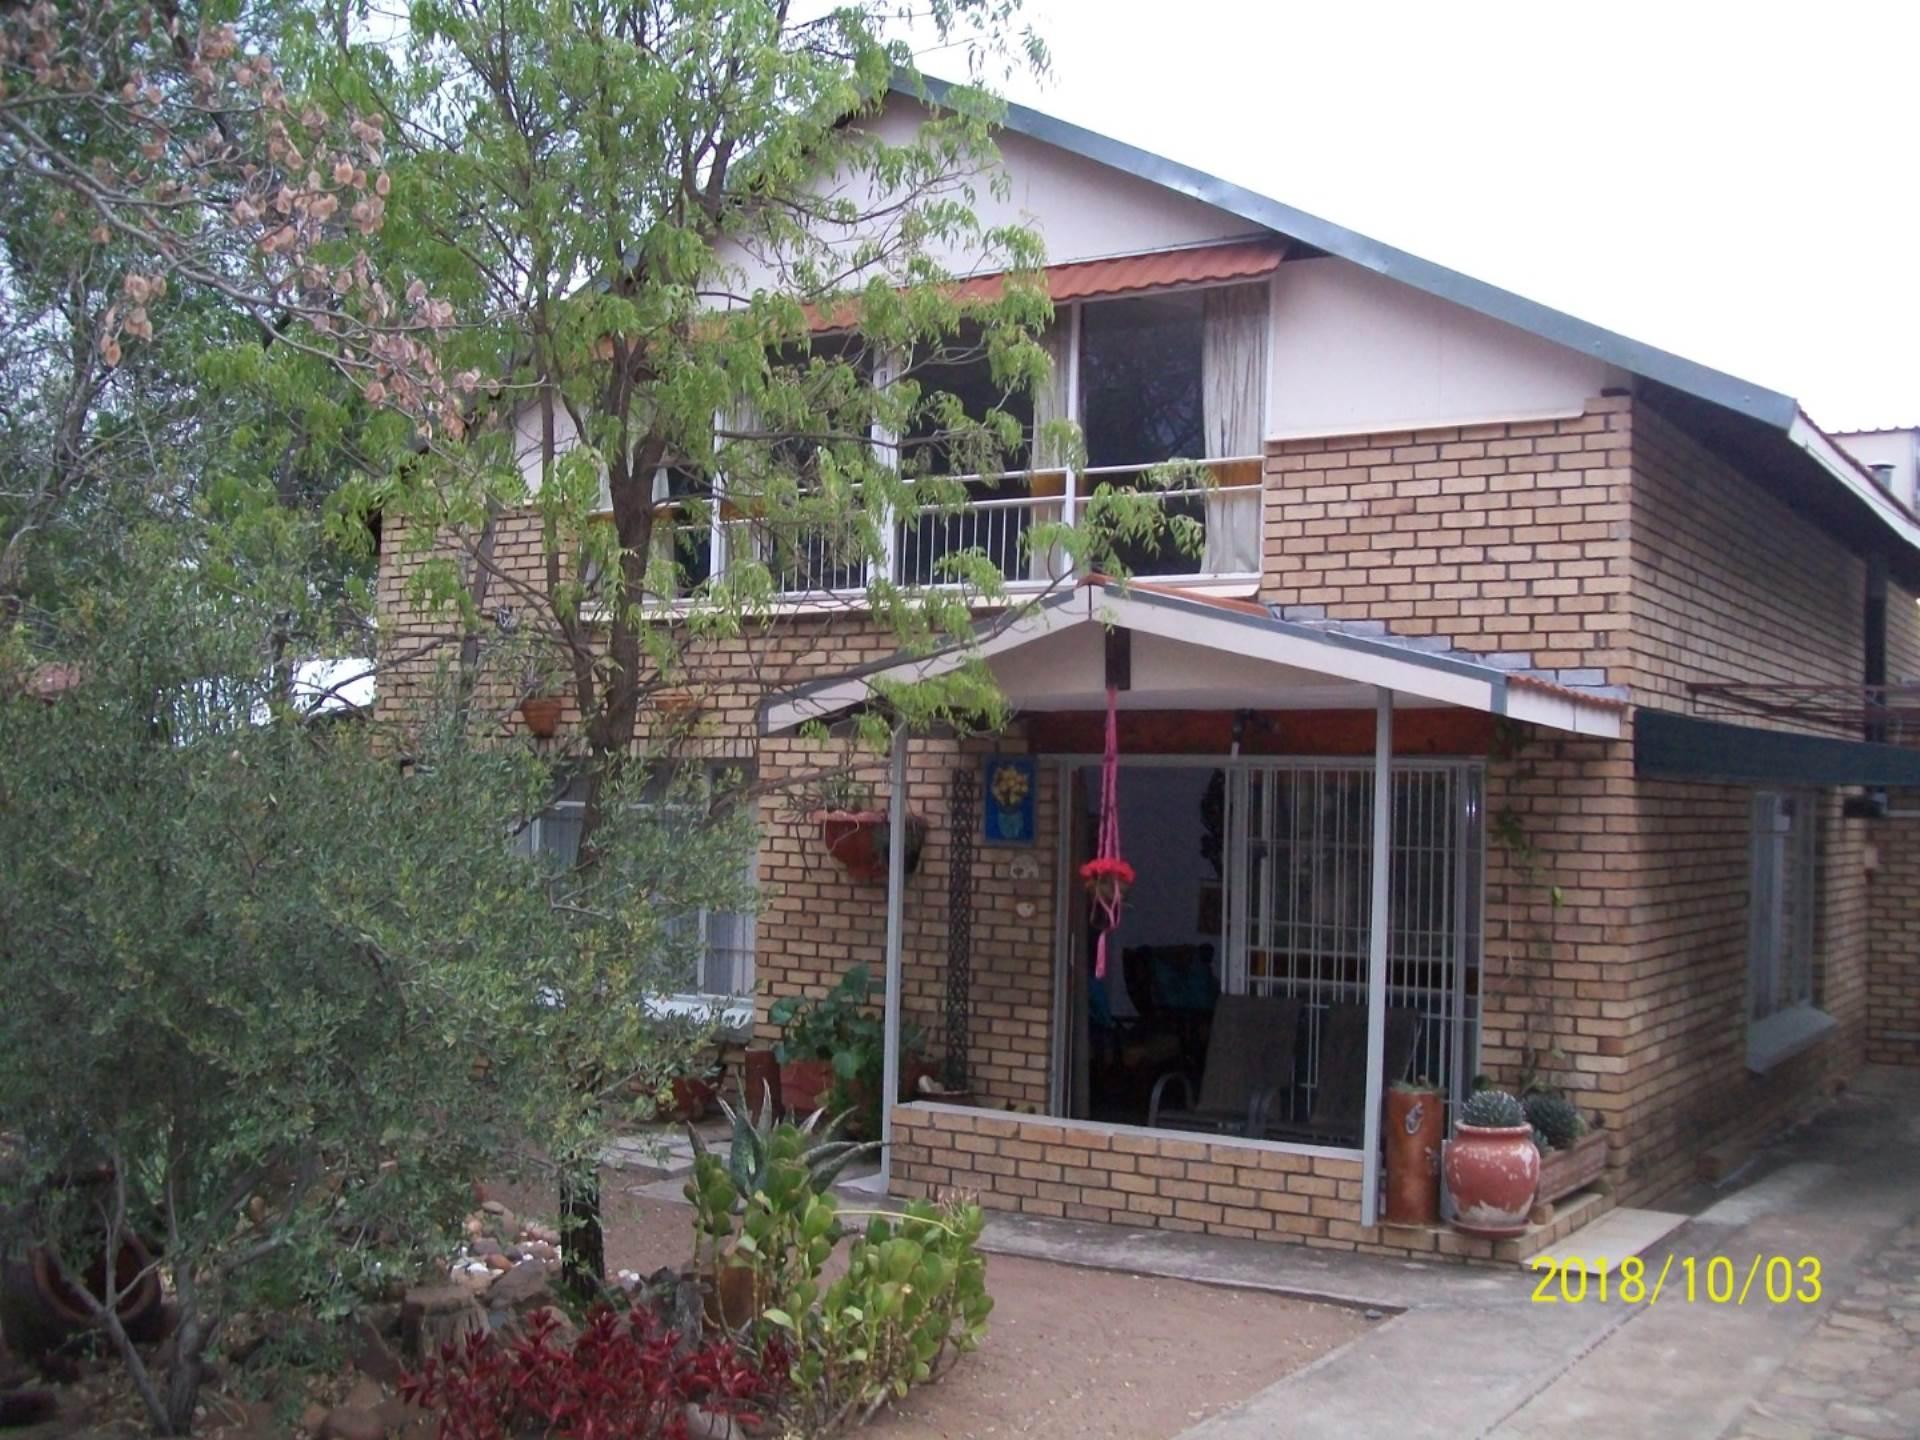 Leeupoort, Leeupoort Property  | Houses For Sale Leeupoort, LEEUPOORT, House 2 bedrooms property for sale Price:879,000